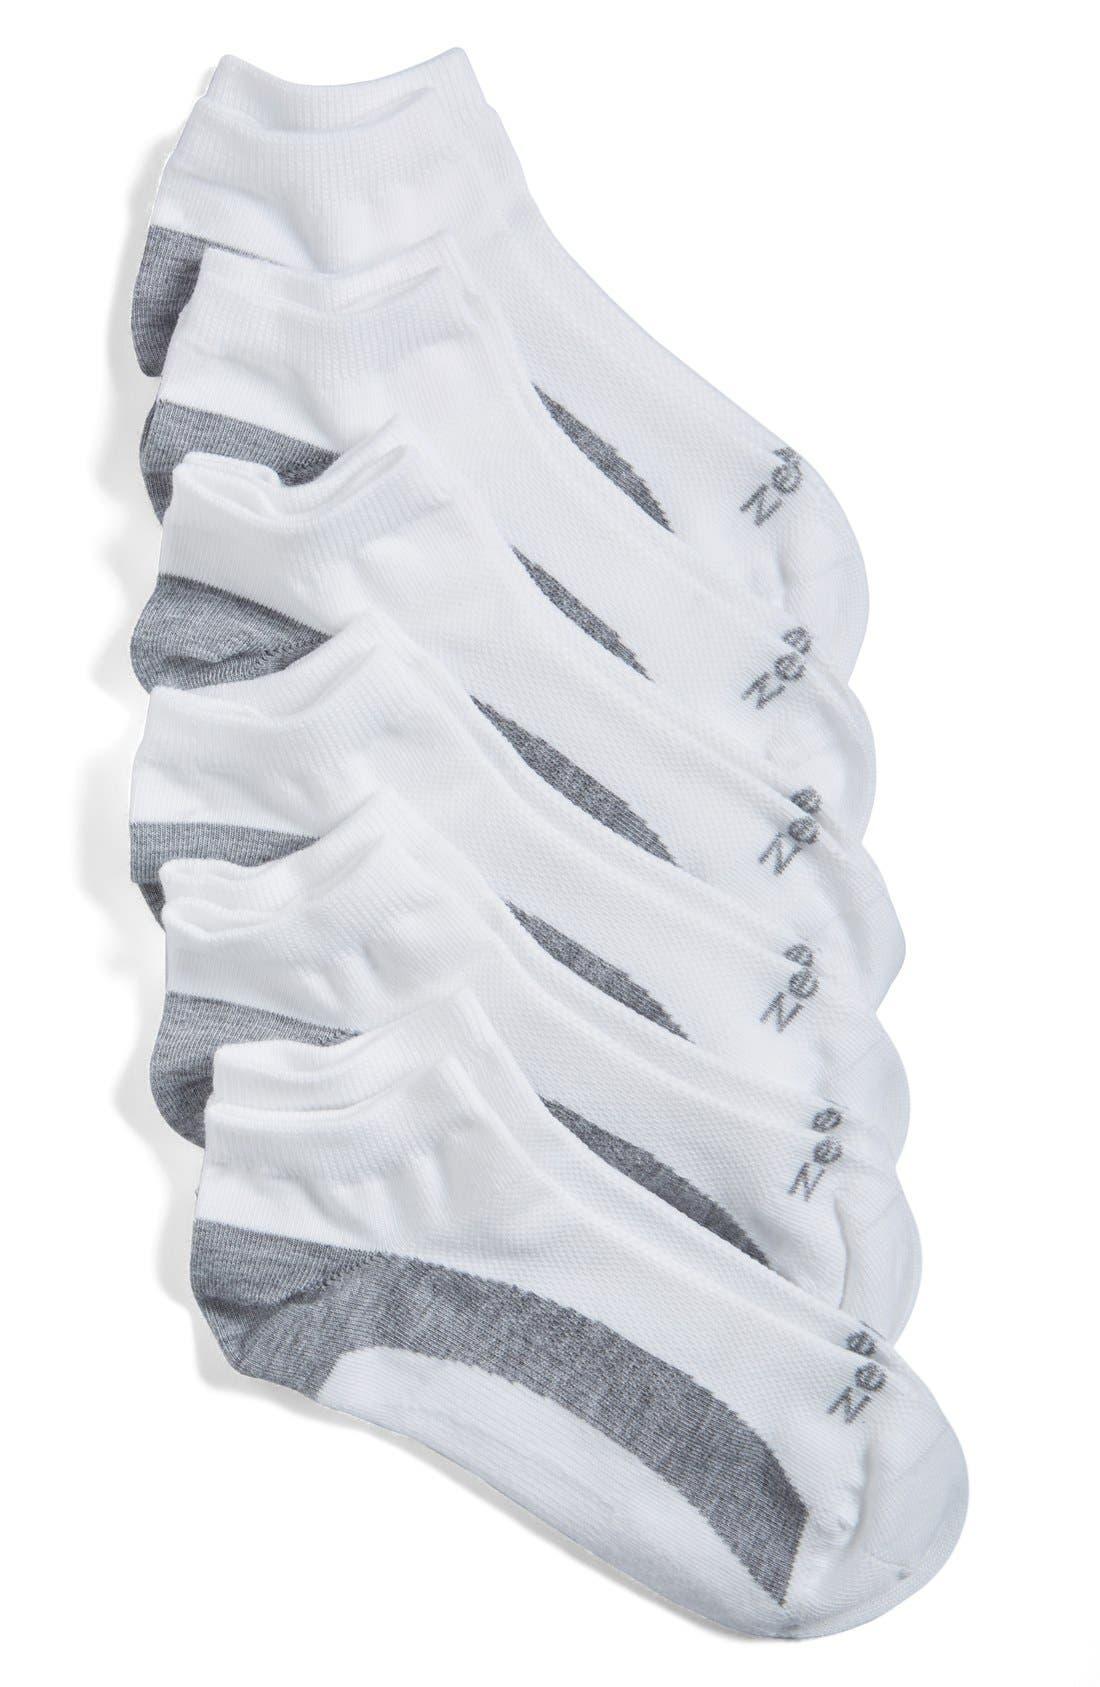 Main Image - Zella 6-Pack Liner Socks